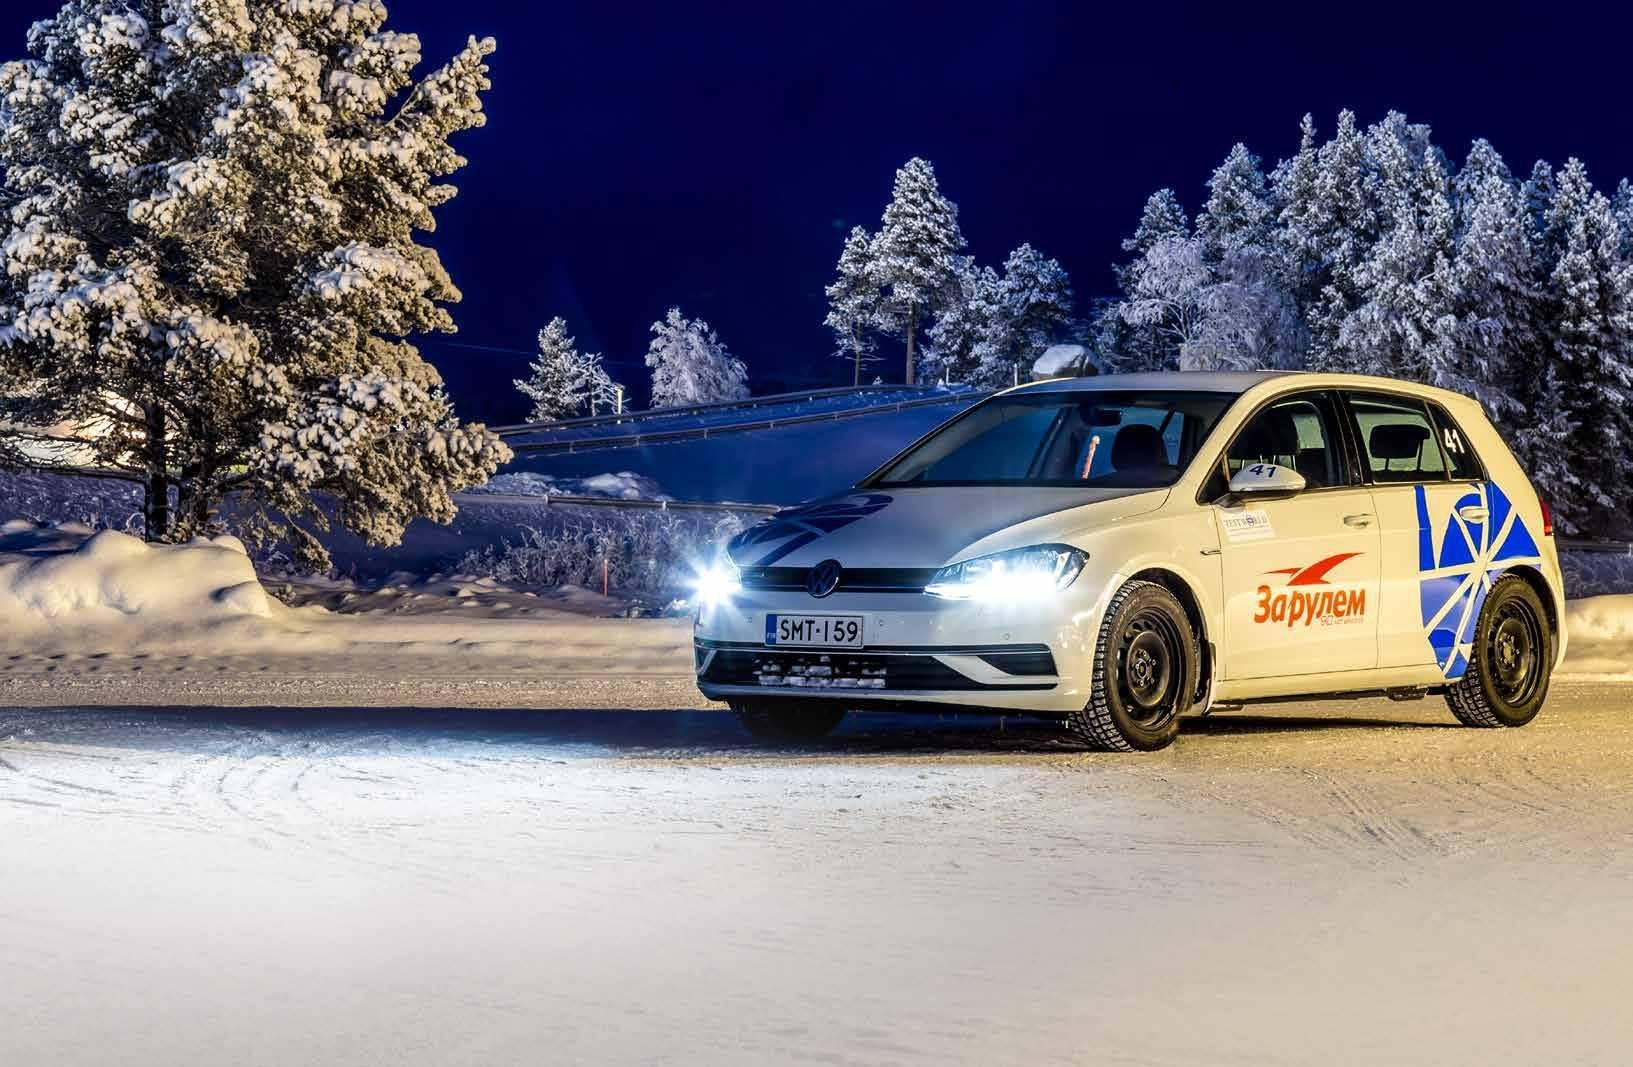 За рулем: Тест зимних шипованных шин 205/55 R16 2019